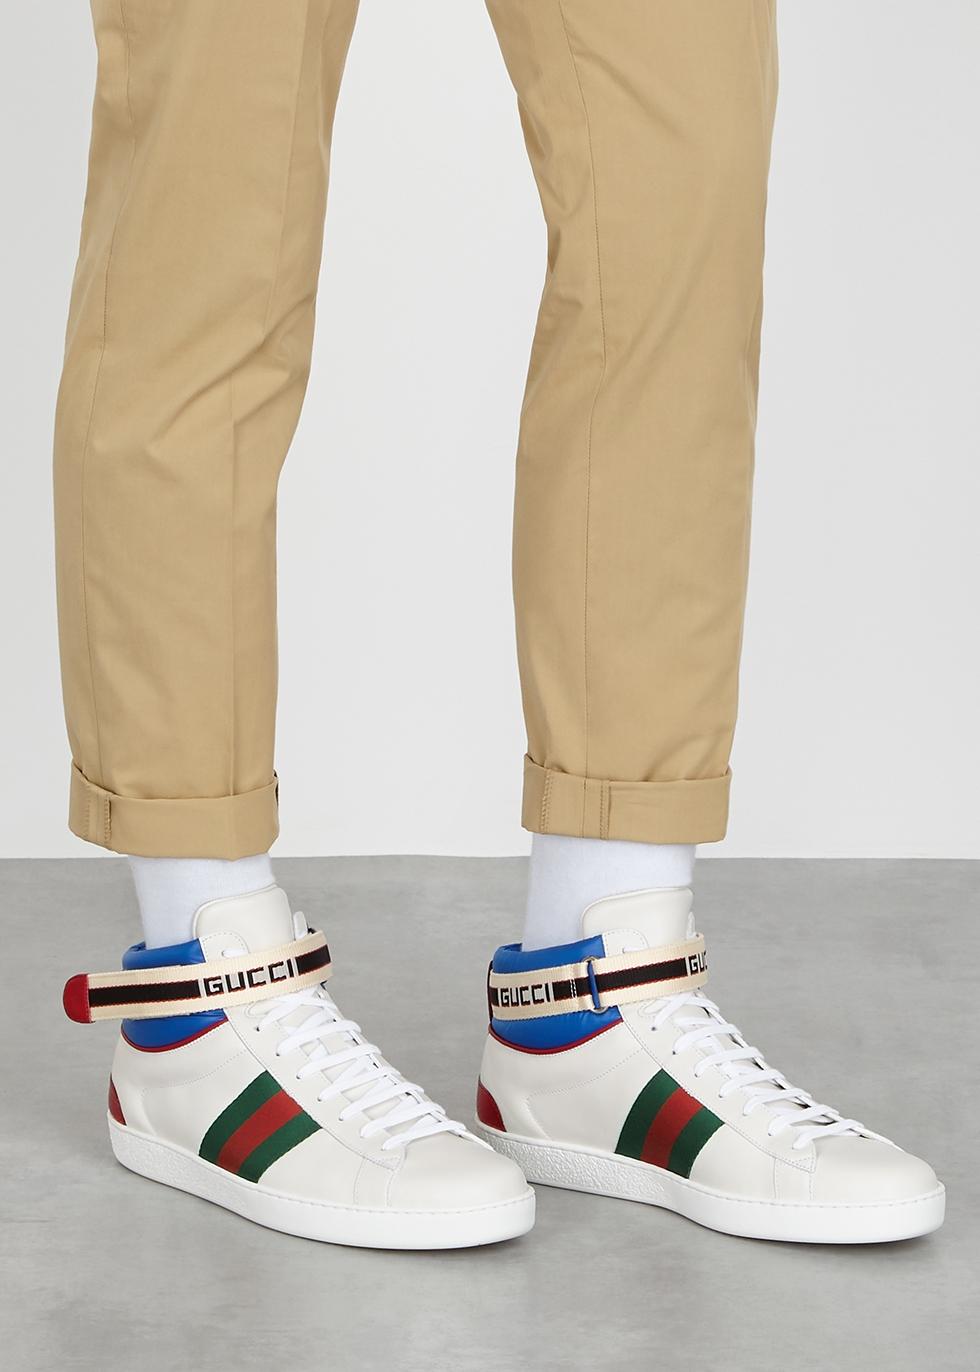 08cf69aa5c45 Men's Designer Trainers, Sneakers & Sports Shoes - Harvey Nichols